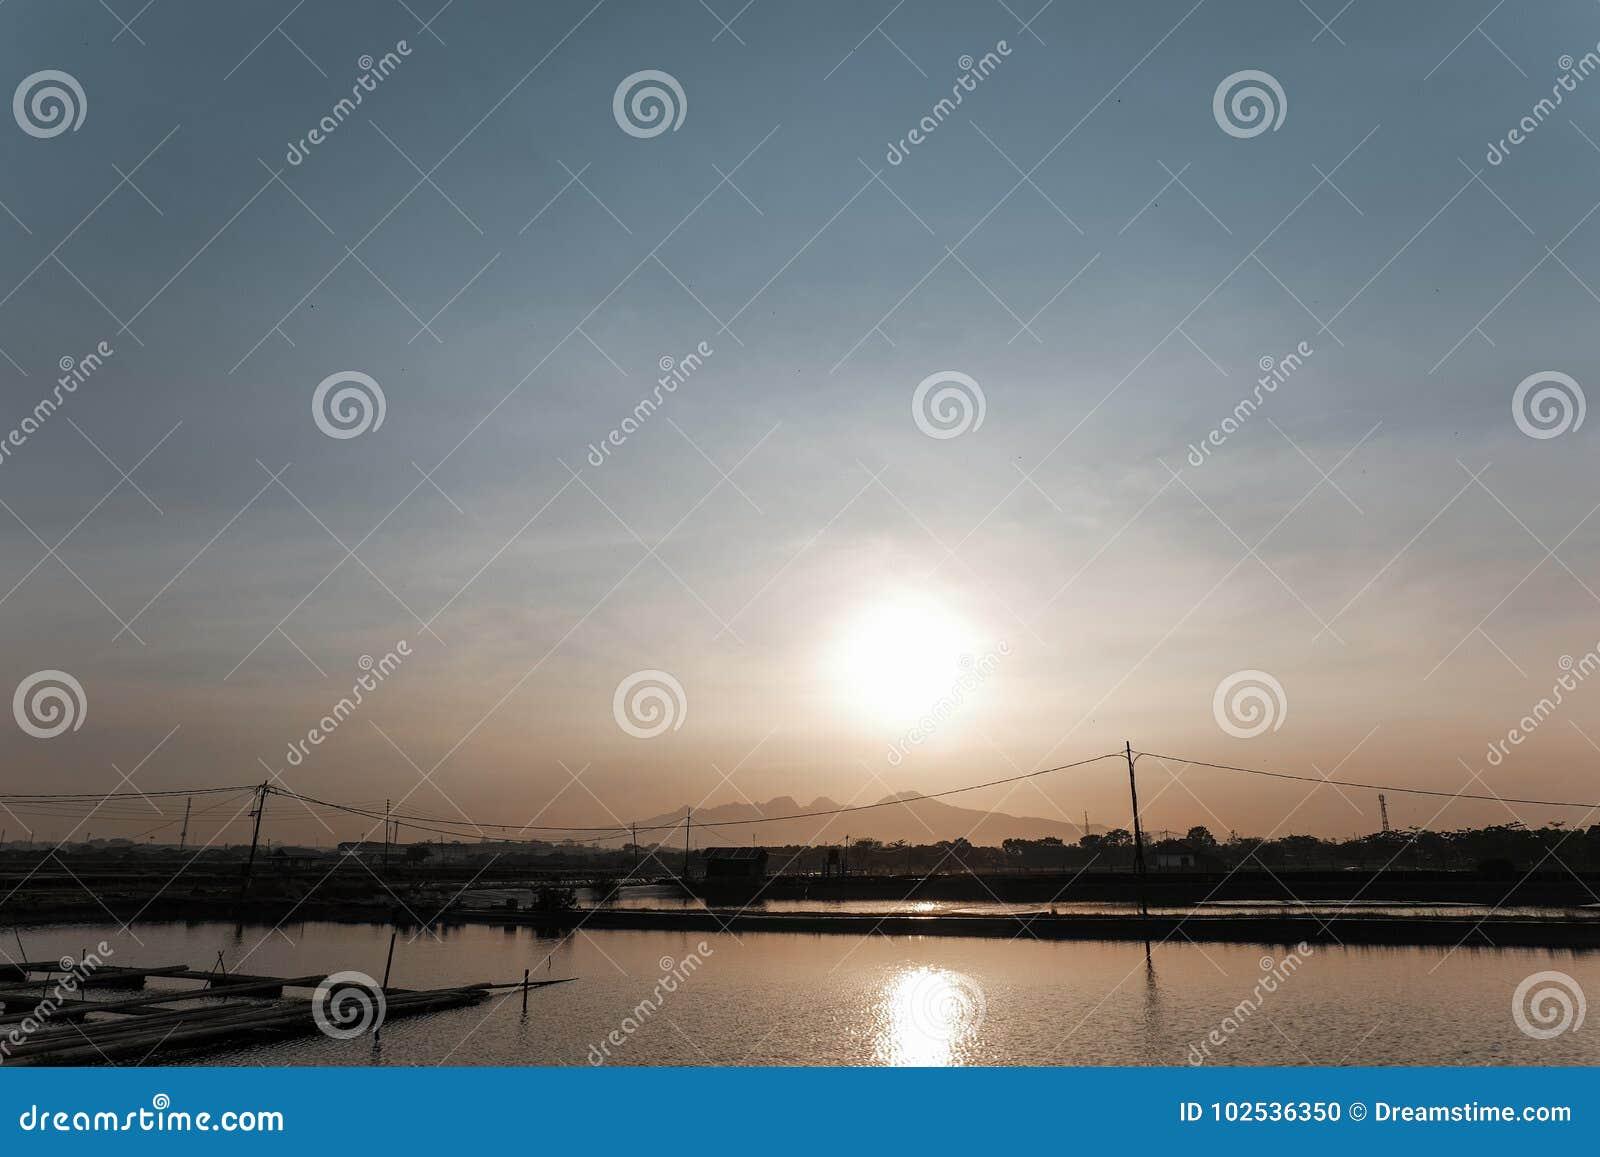 Sea sun and mountains